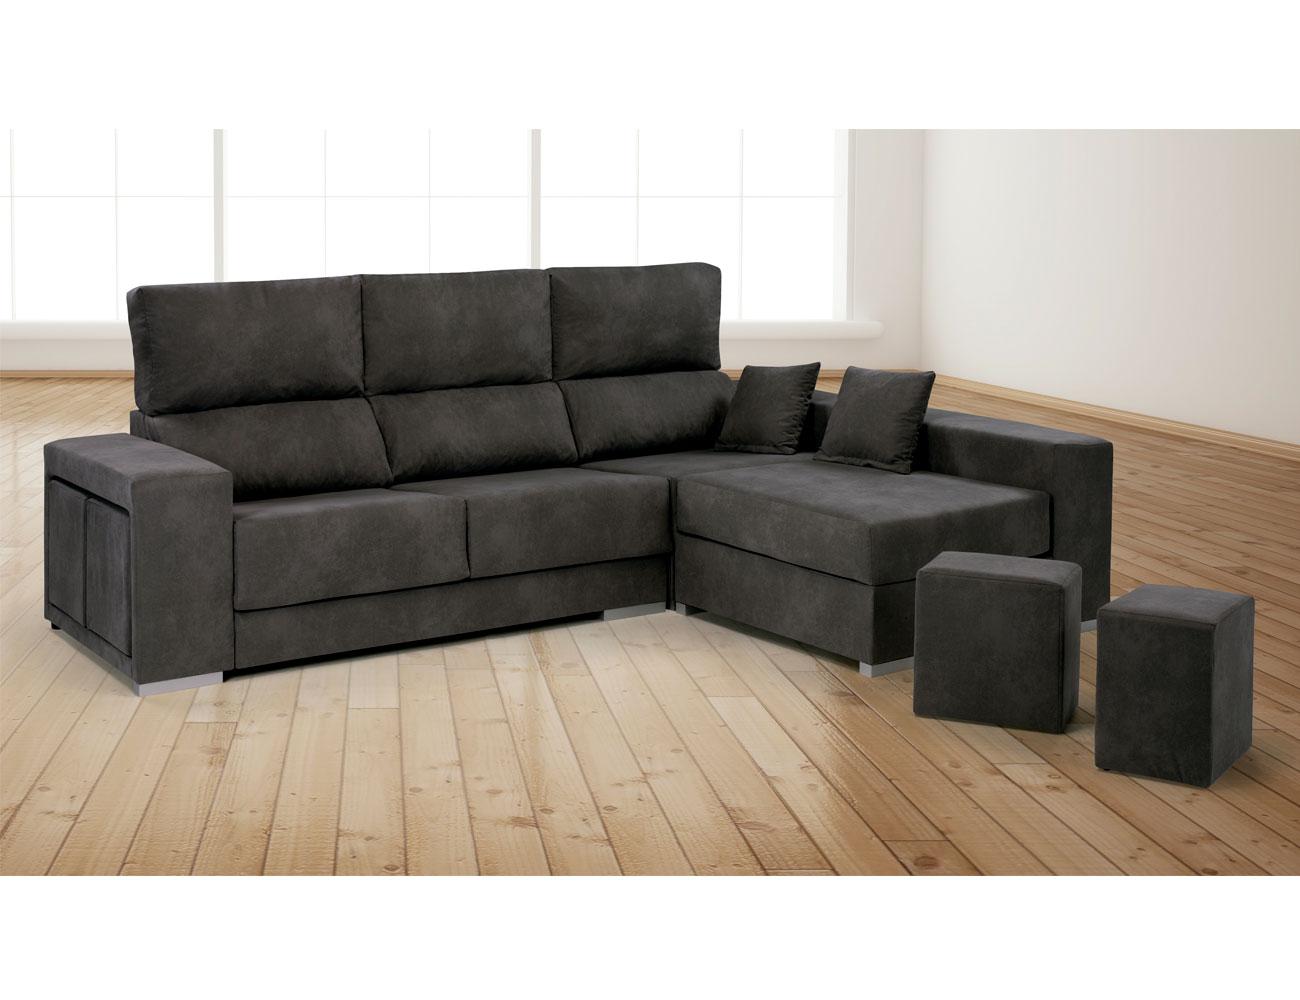 Puff mueble mesa de centro blanca puff completa for Combinar sofa gris marengo